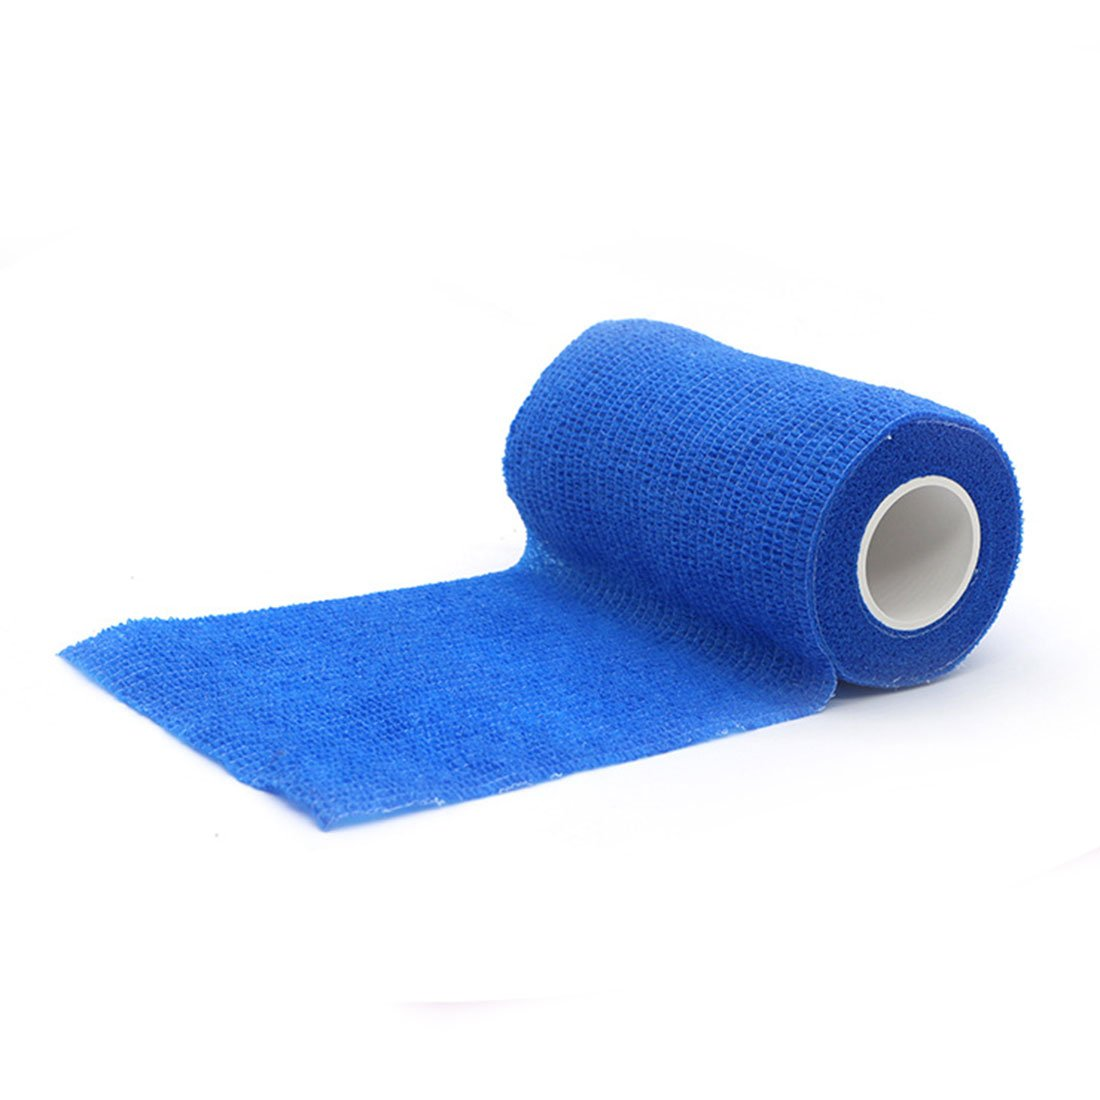 YYF Vet Tape Wrap Bulk,2'' Self Adherent Wrap Tape,Self Adhering Stick Bandage,Self Grip Roll,Stretchable Bandage Wrap Vet Tape - 2'' Inches x 15' Feet (6 Rolls,12 Rolls,18 Rolls,24 Rolls,Single Roll)